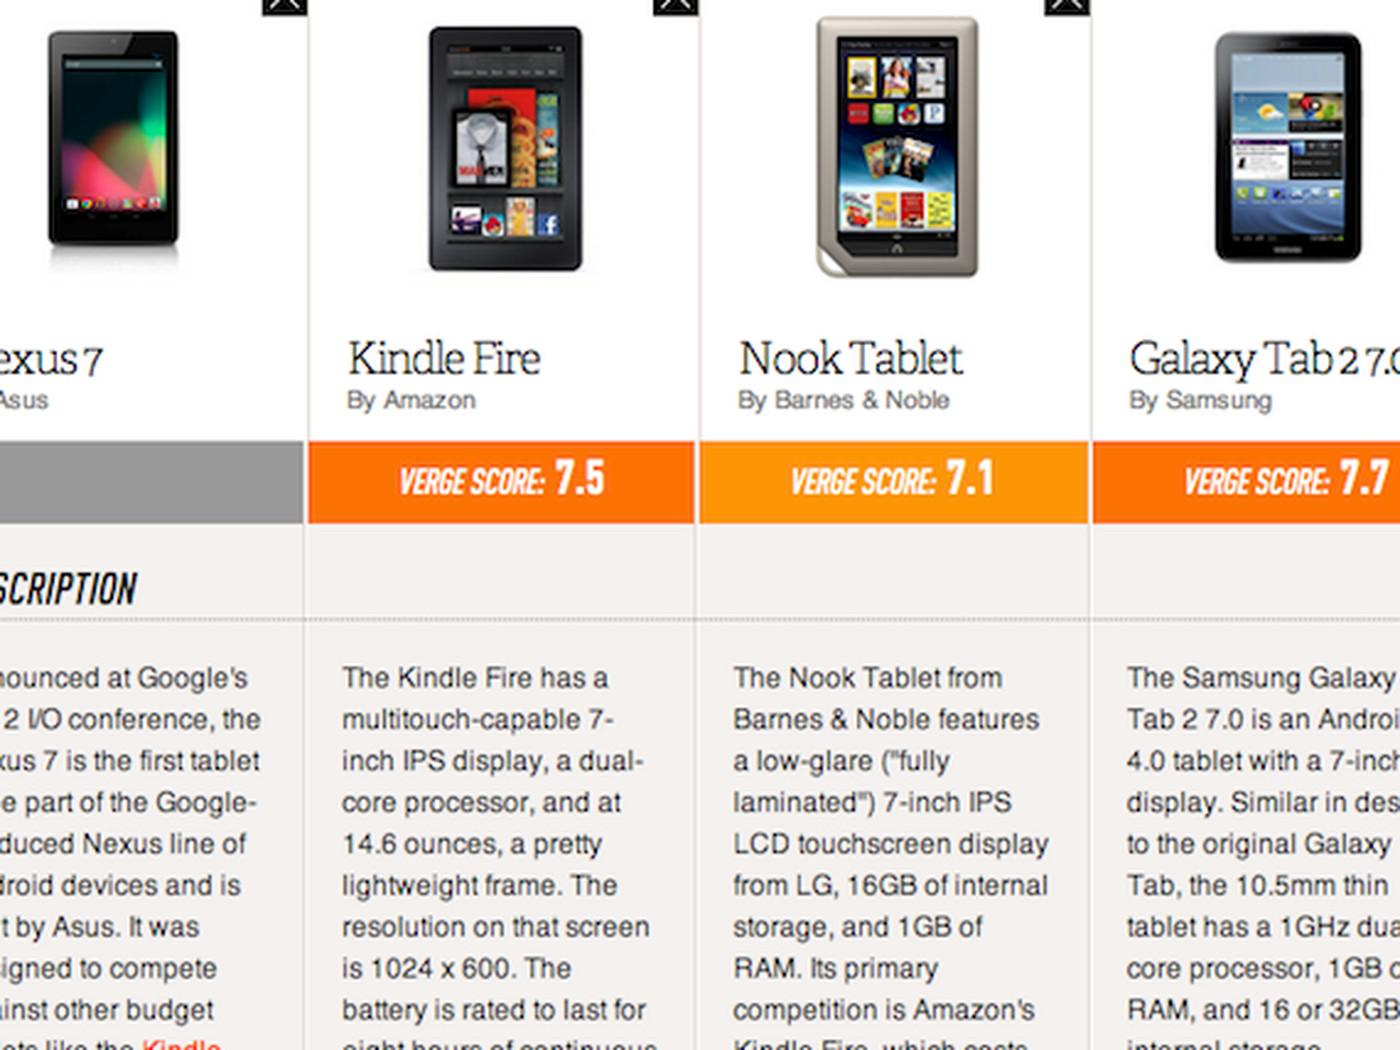 Google Nexus 7 vs  Kindle Fire, Nook Tablet, and Galaxy Tab 2 7 0